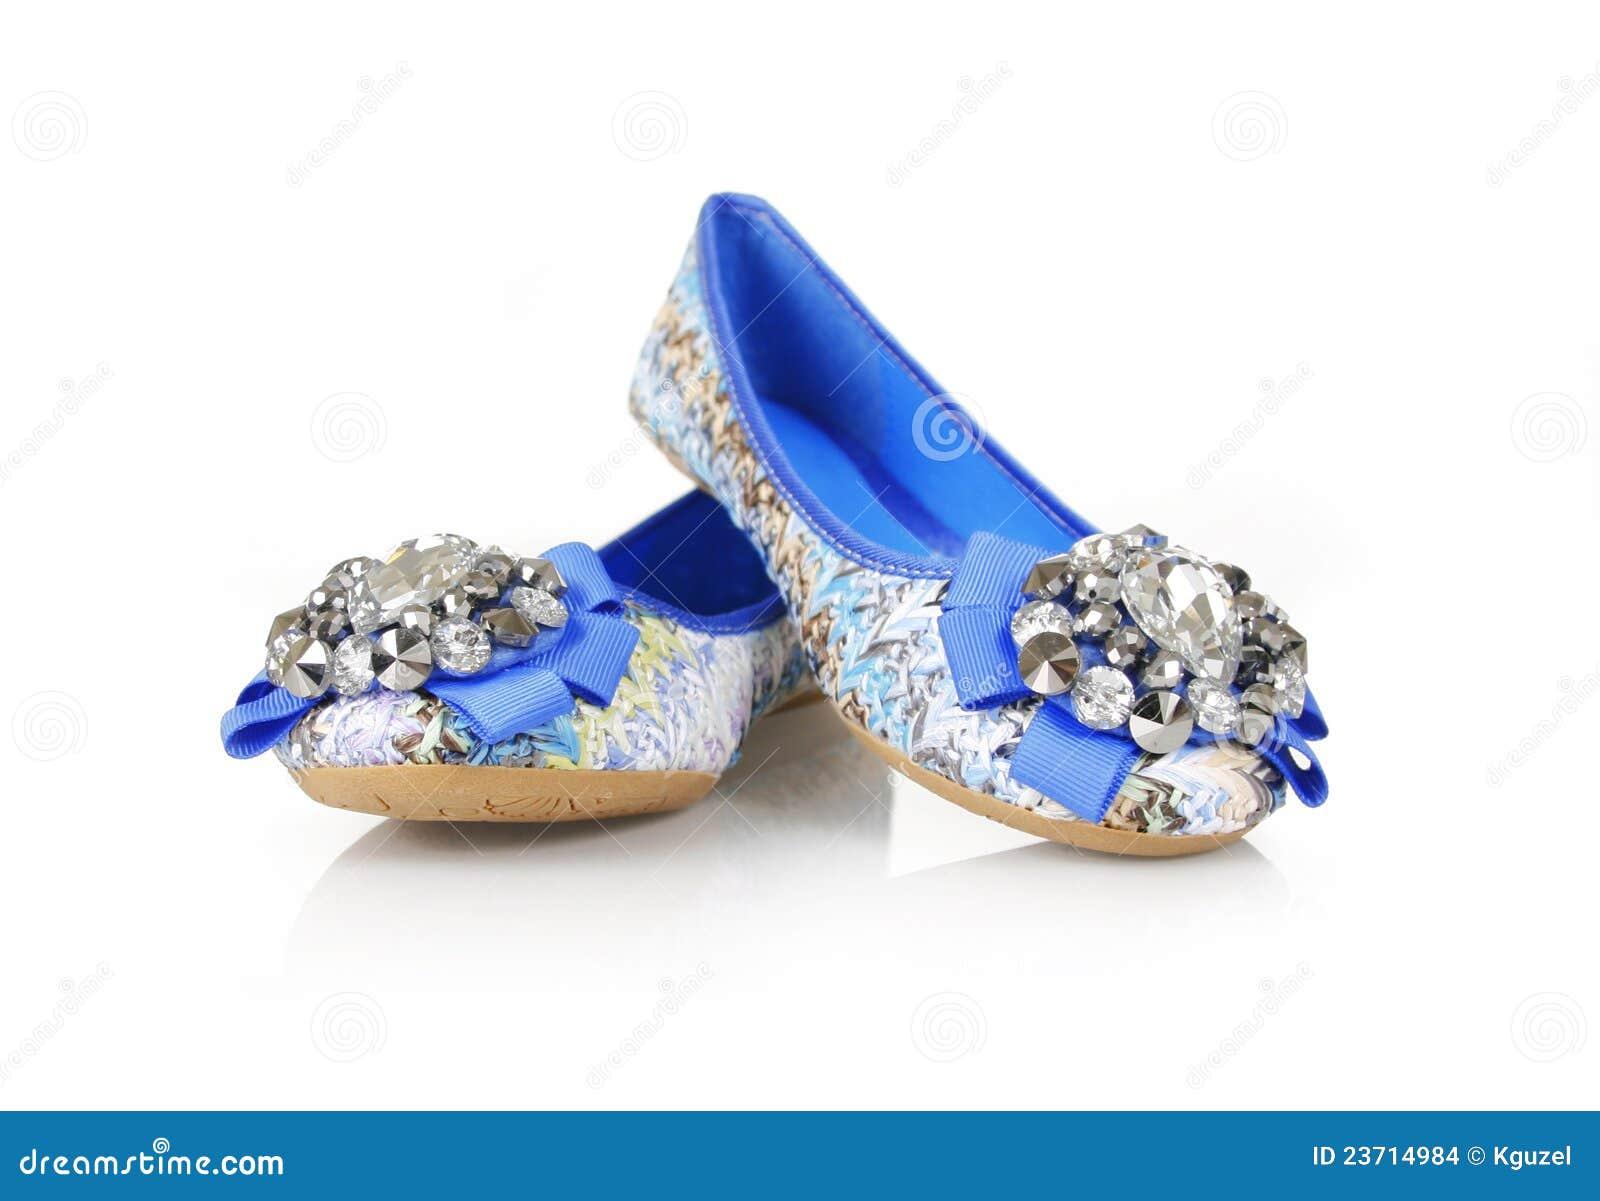 21e219504 Jeweled blue flats shoes stock photo. Image of fashion - 23714984